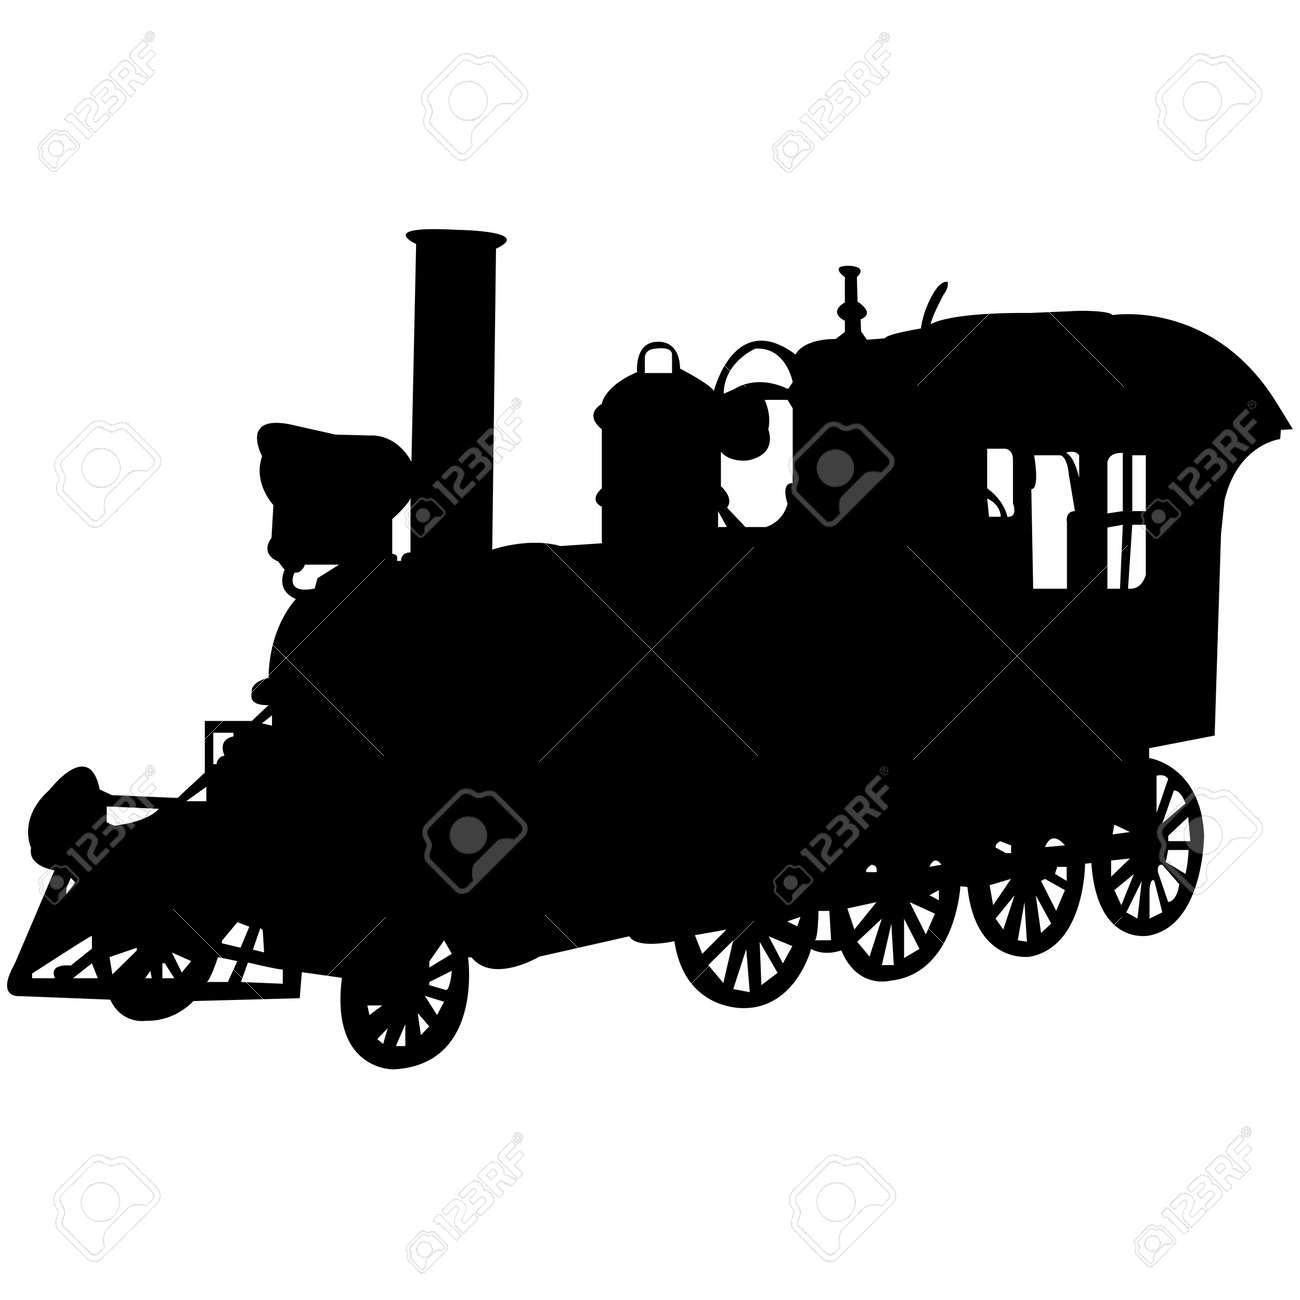 Steam Engine Silhouette Vector - 158121931